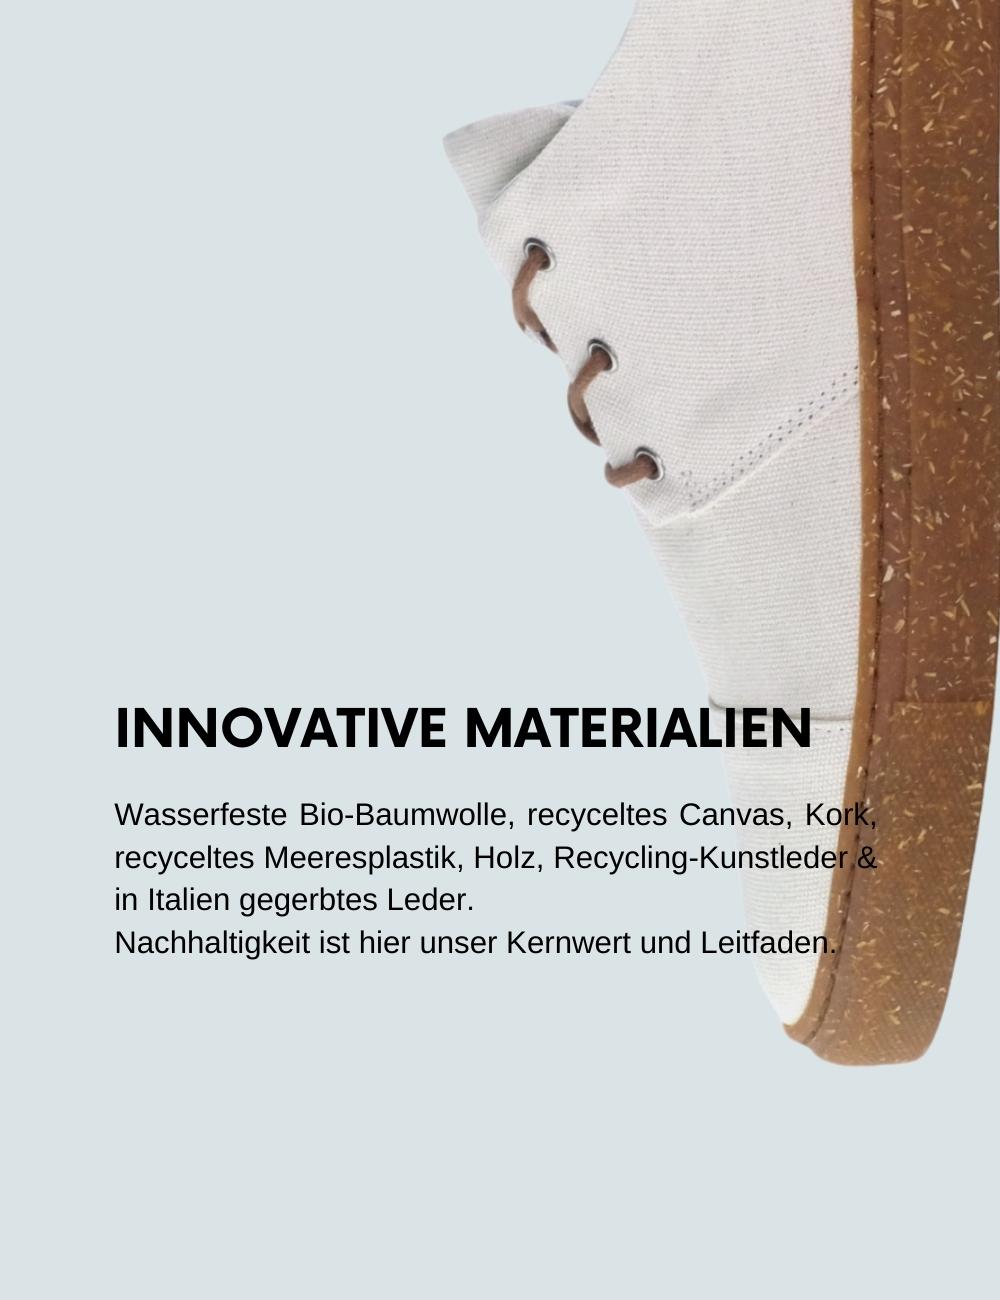 Schuhe faire Produktion nachhaltig vegan Europa